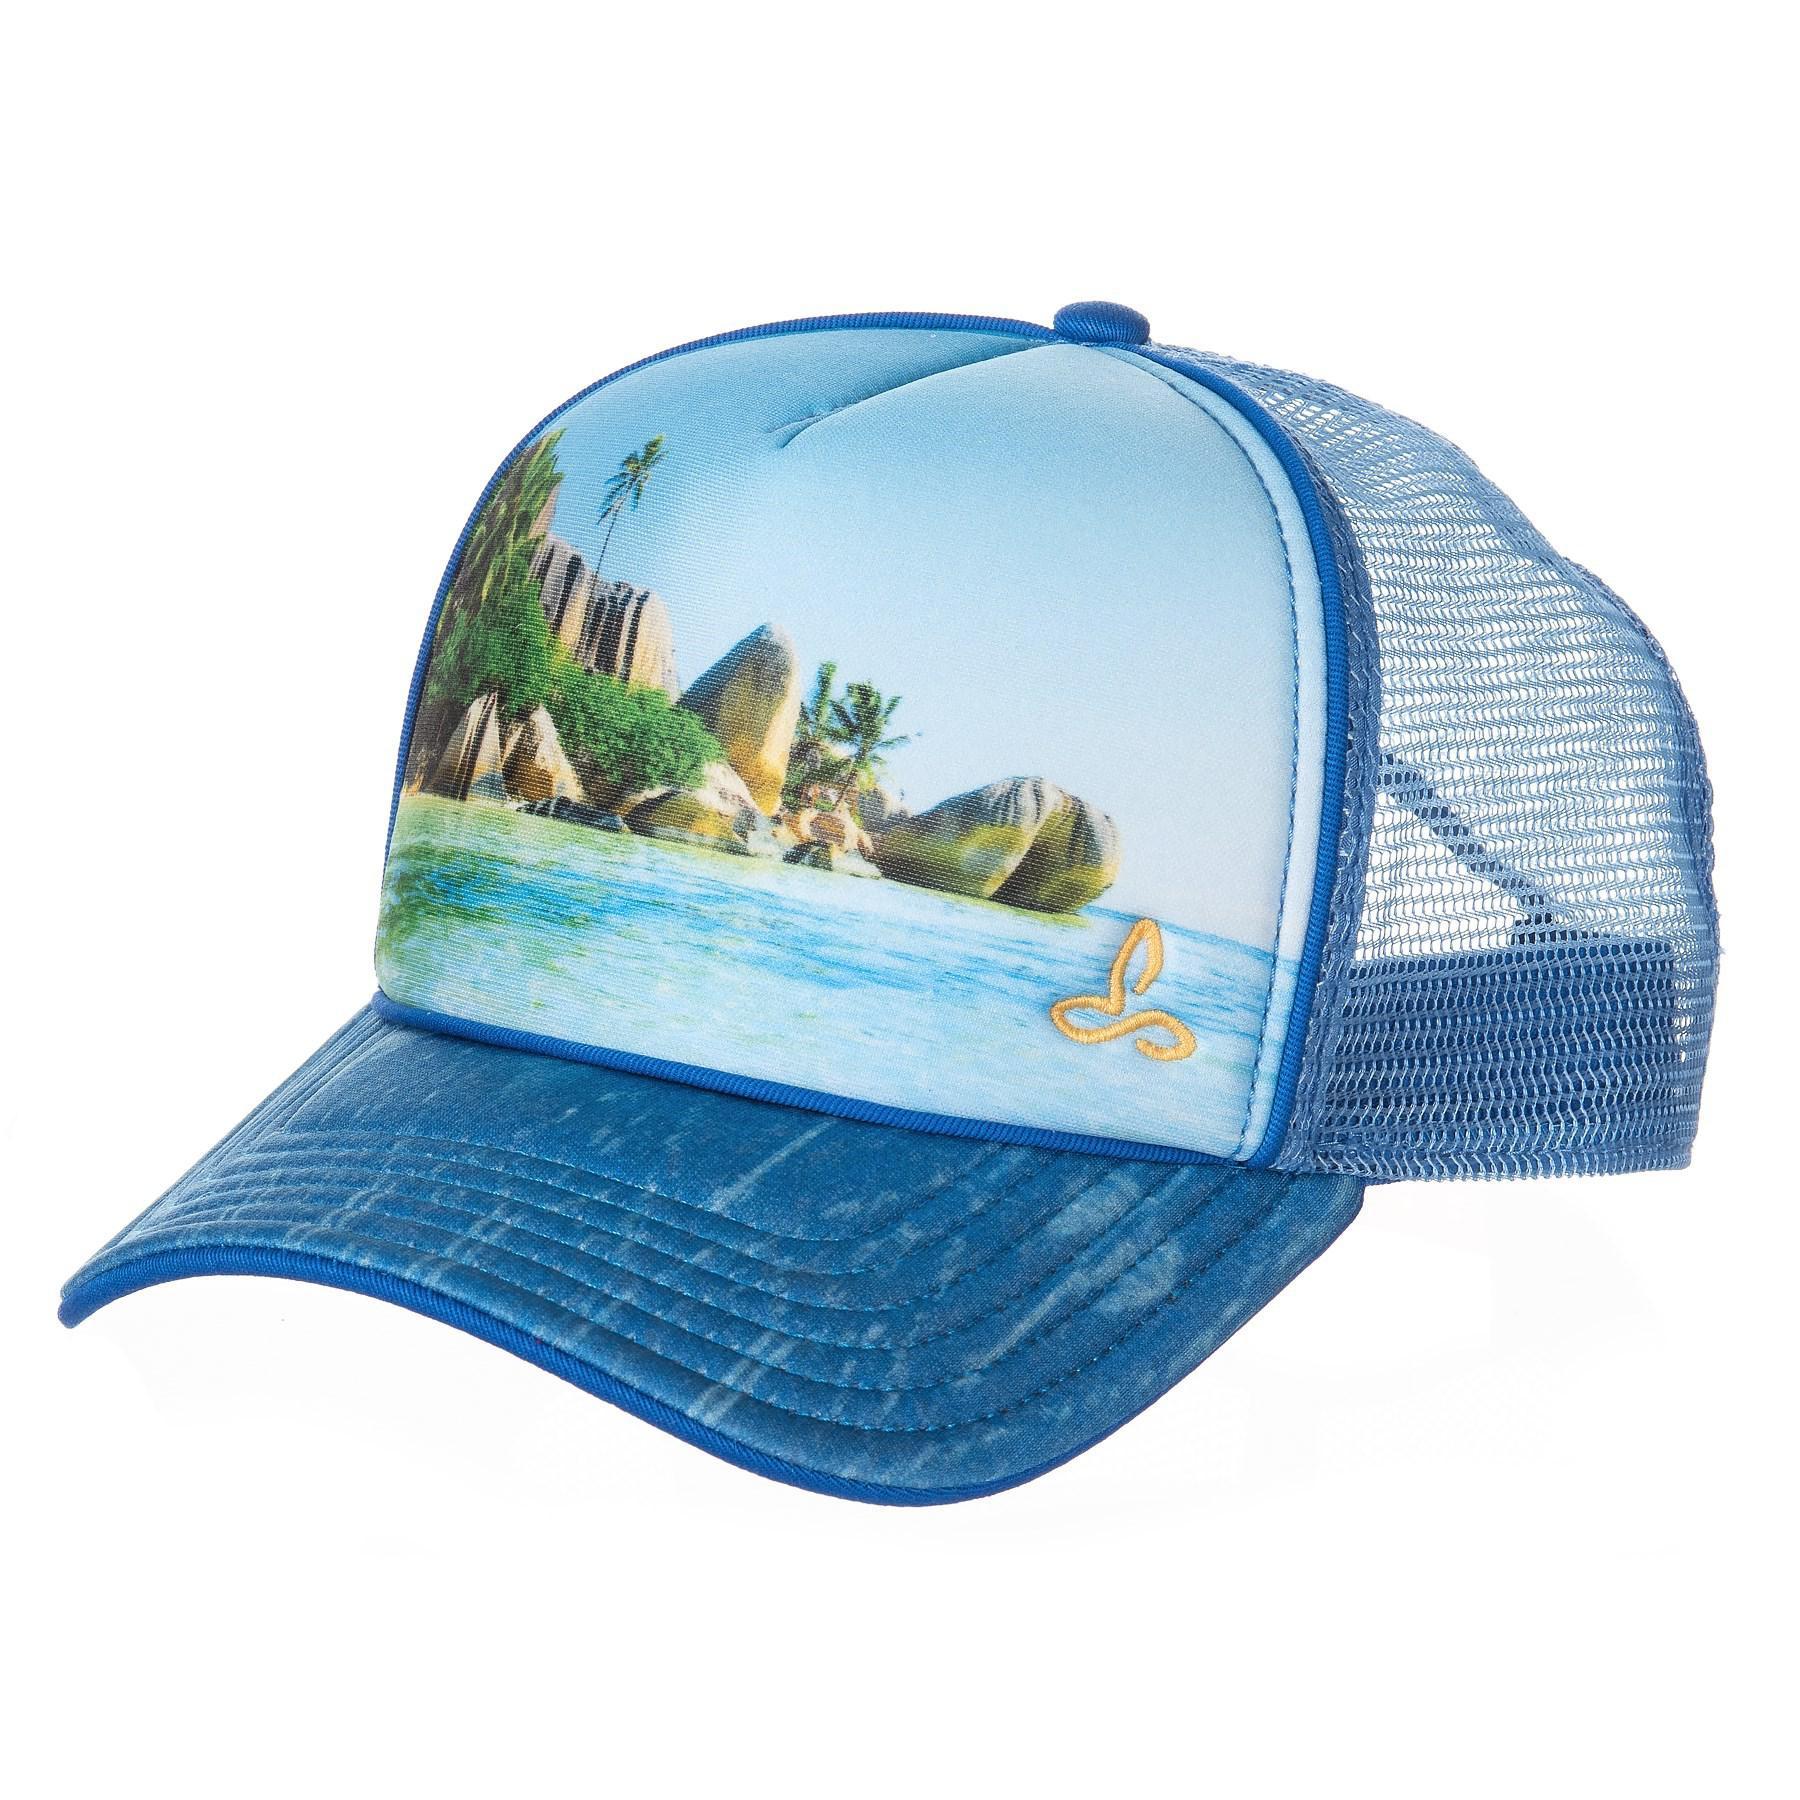 38ccf7d1e710d5 Lyst - Prana Rio Ball Cap in Blue - Save 27%